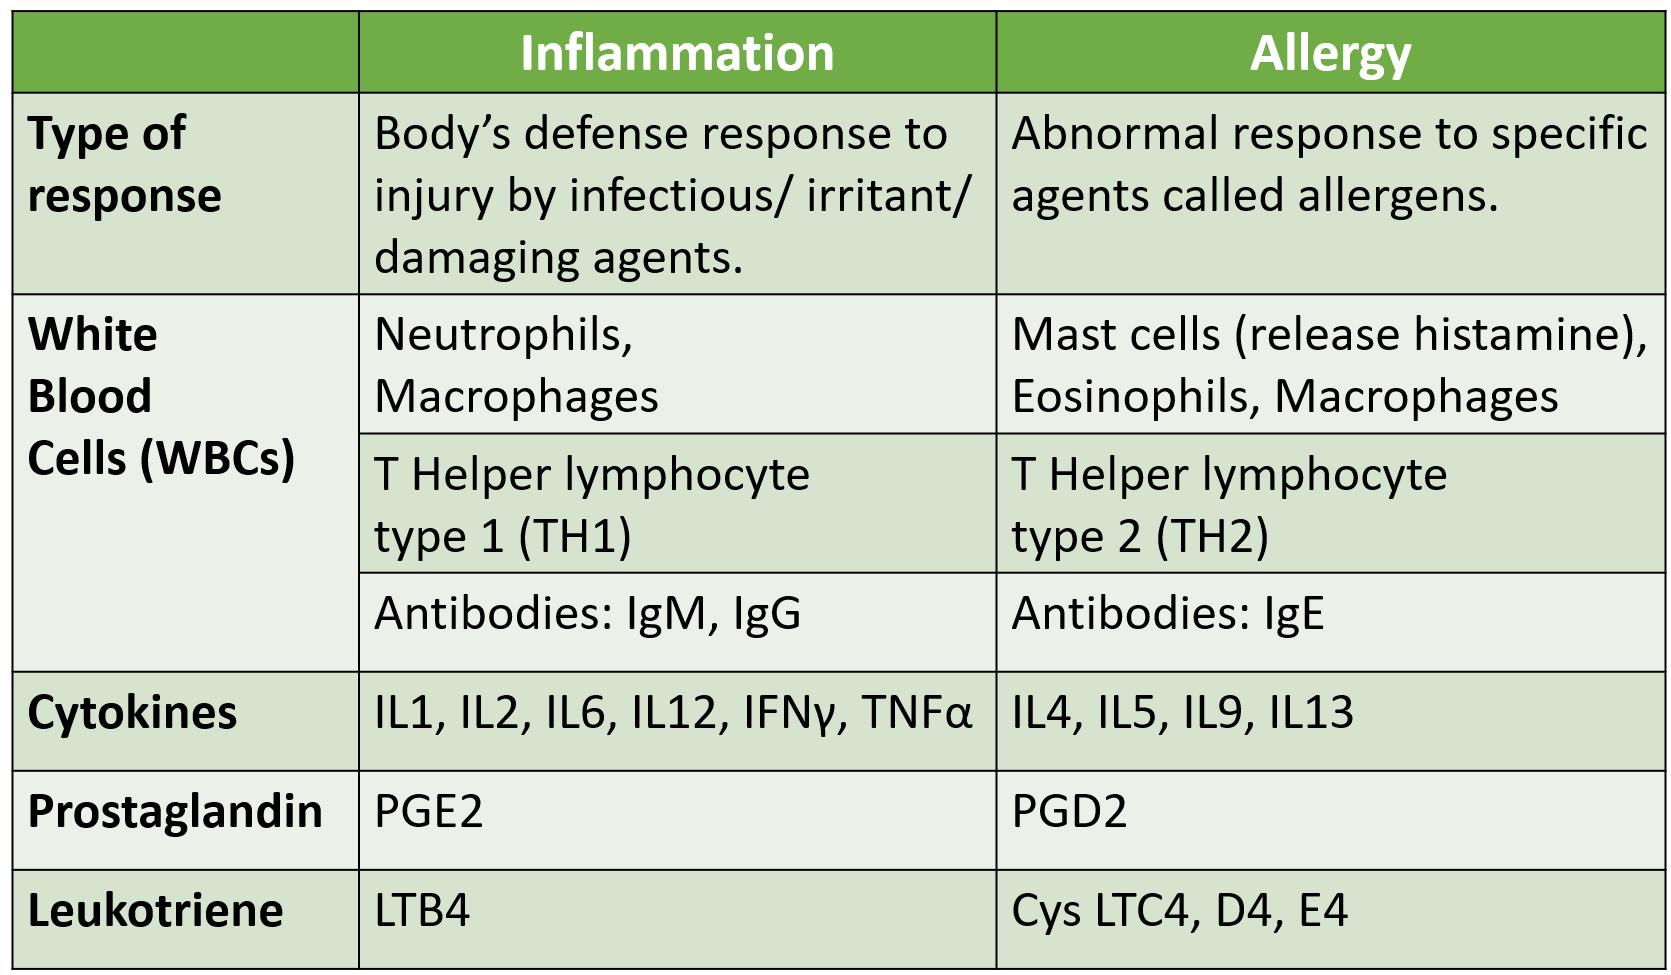 Allergy vs Inflammation